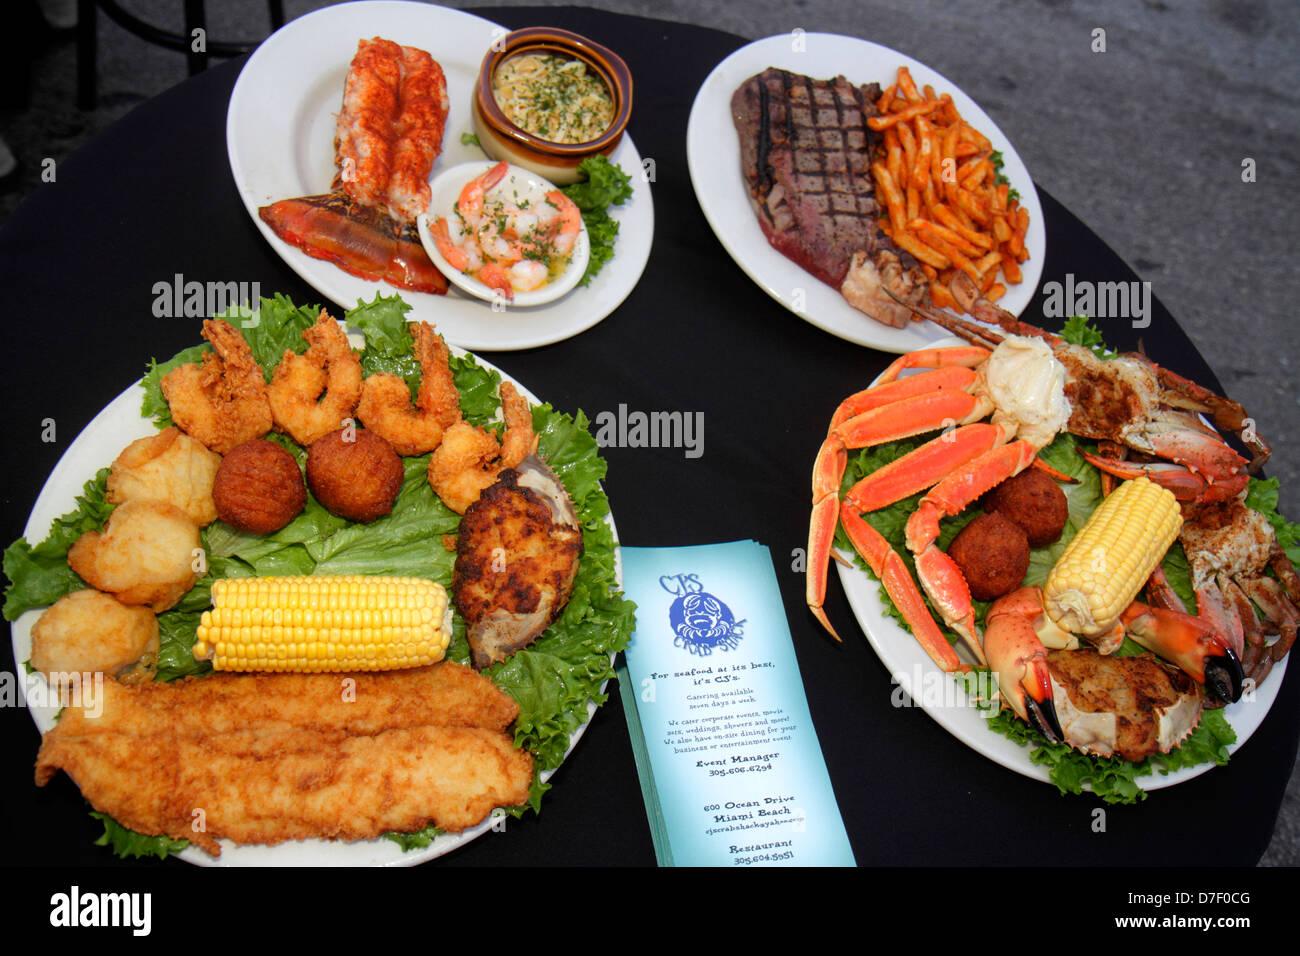 Miami Beach Florida Ocean Drive CJ's restaurant food display plates Stock Photo, Royalty Free ...